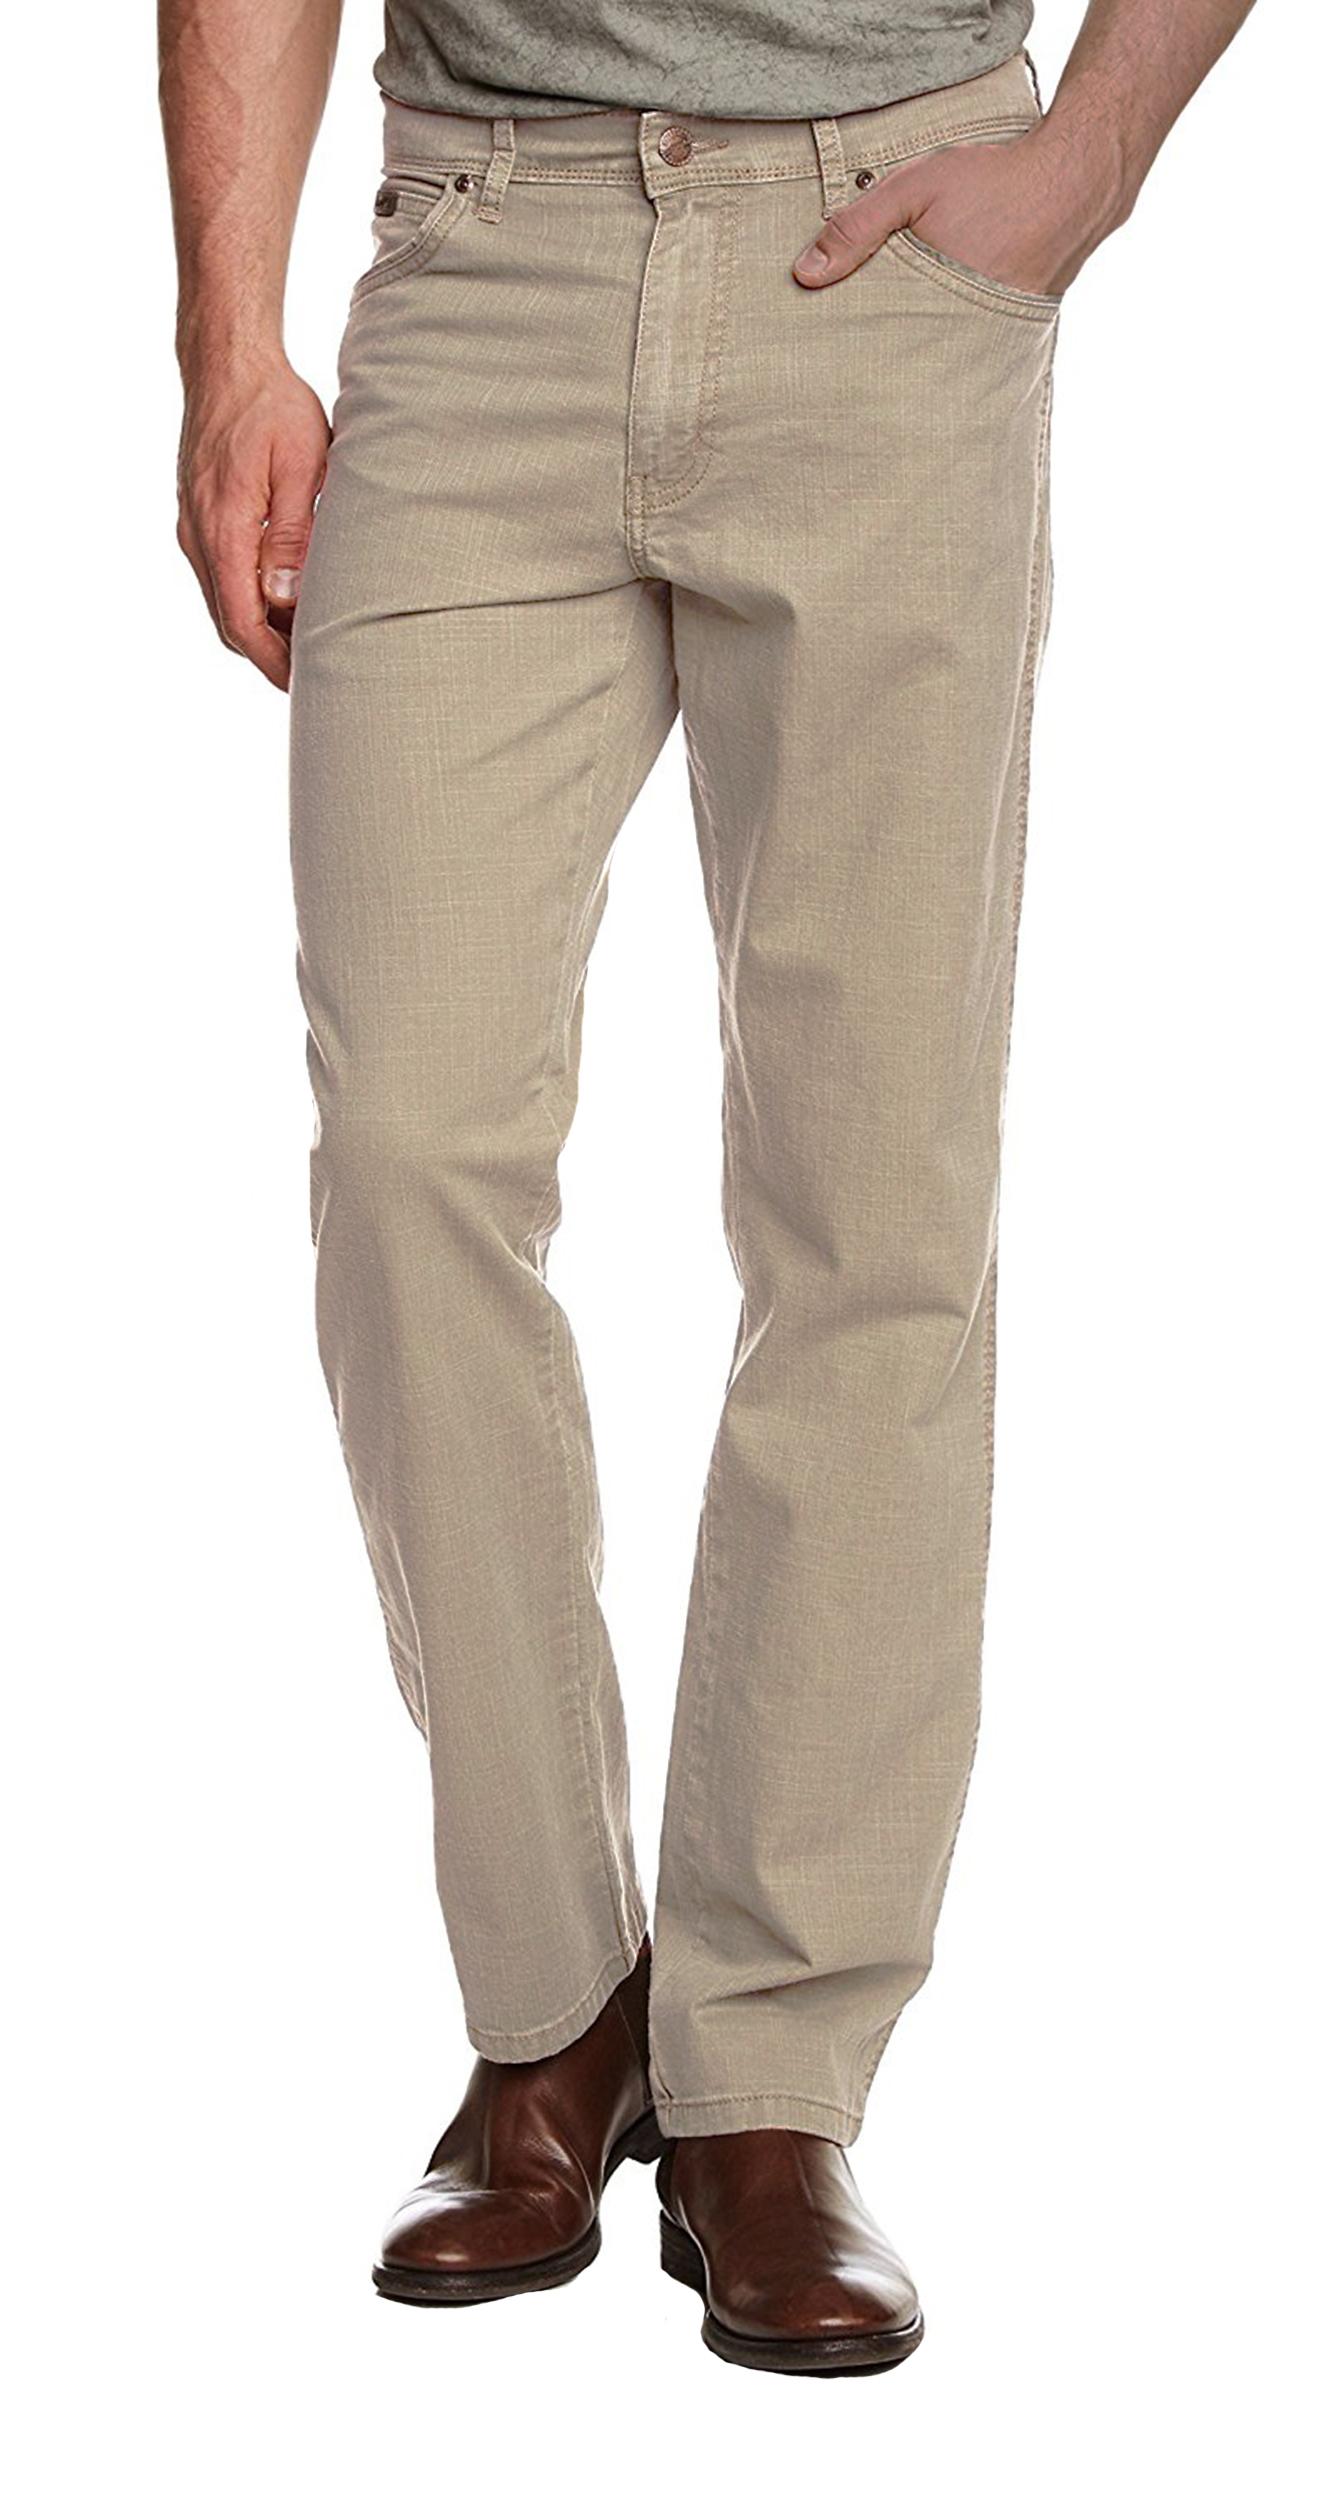 Wrangler Texas Stretch Jeans Mens Chino Style Light Soft Fabric Cornstalk Beige